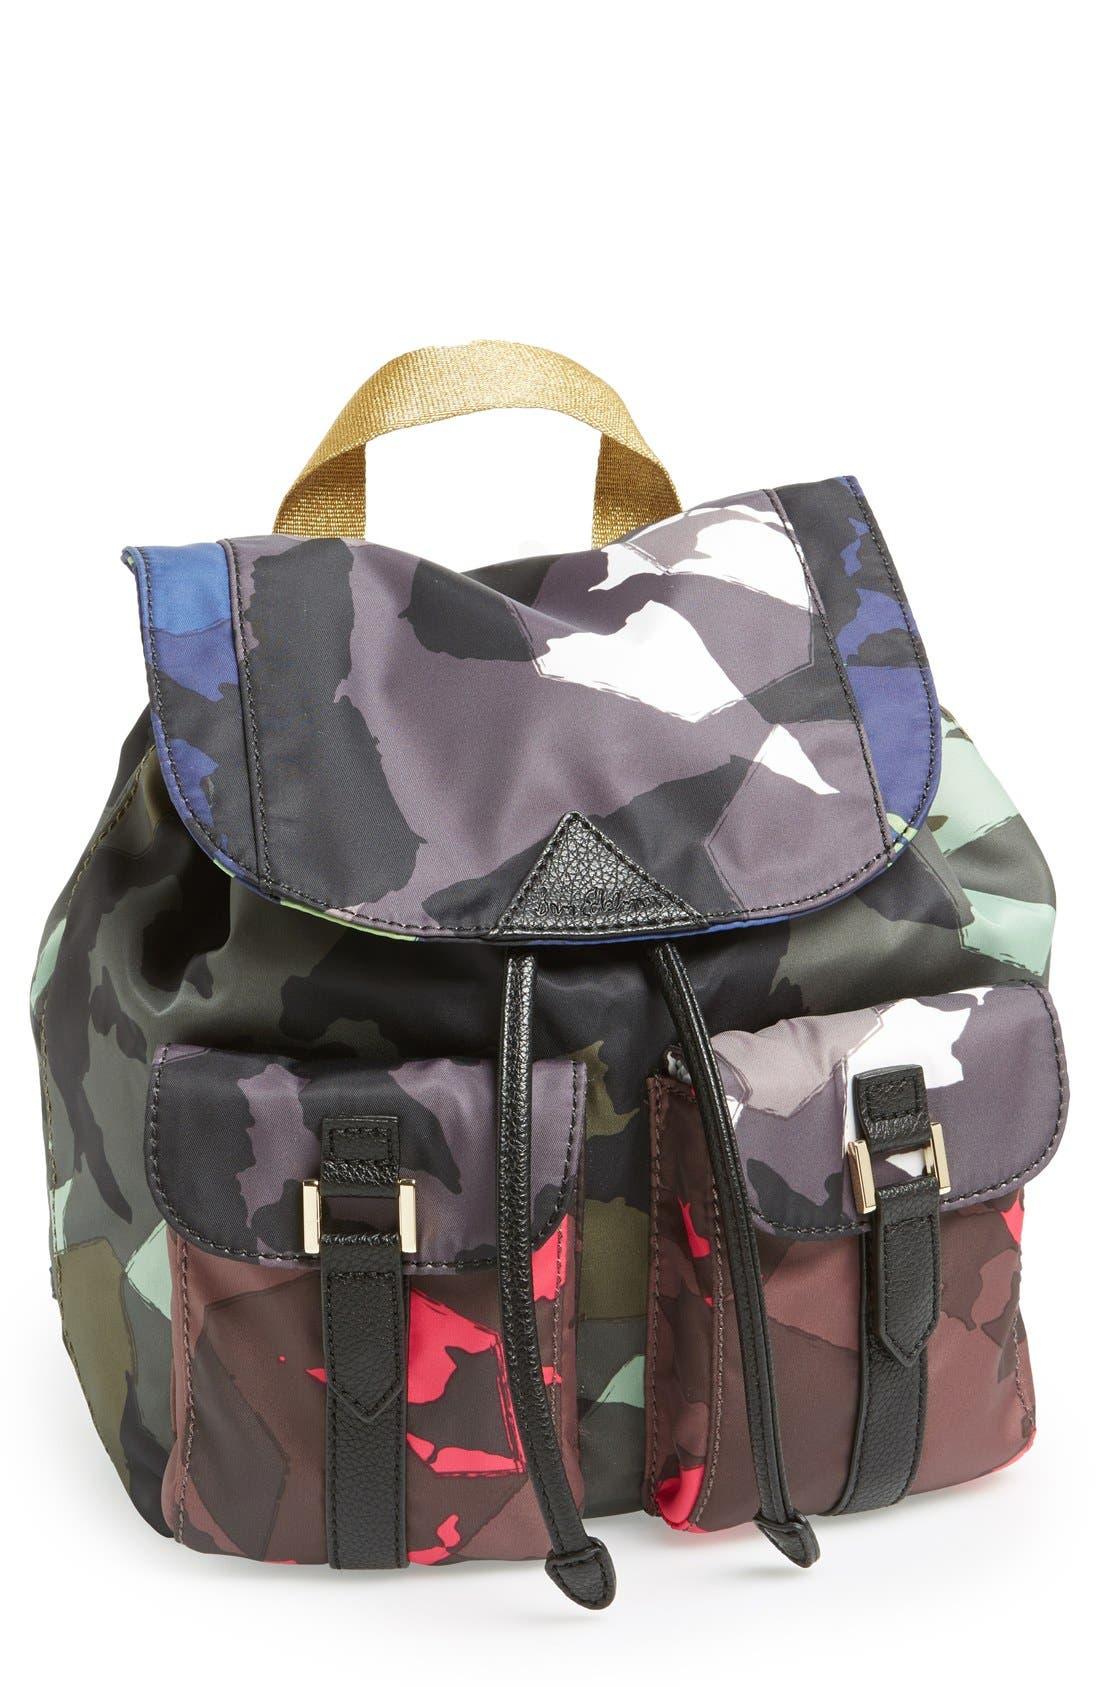 Alternate Image 1 Selected - Sam Edelman 'Large' Nylon Backpack